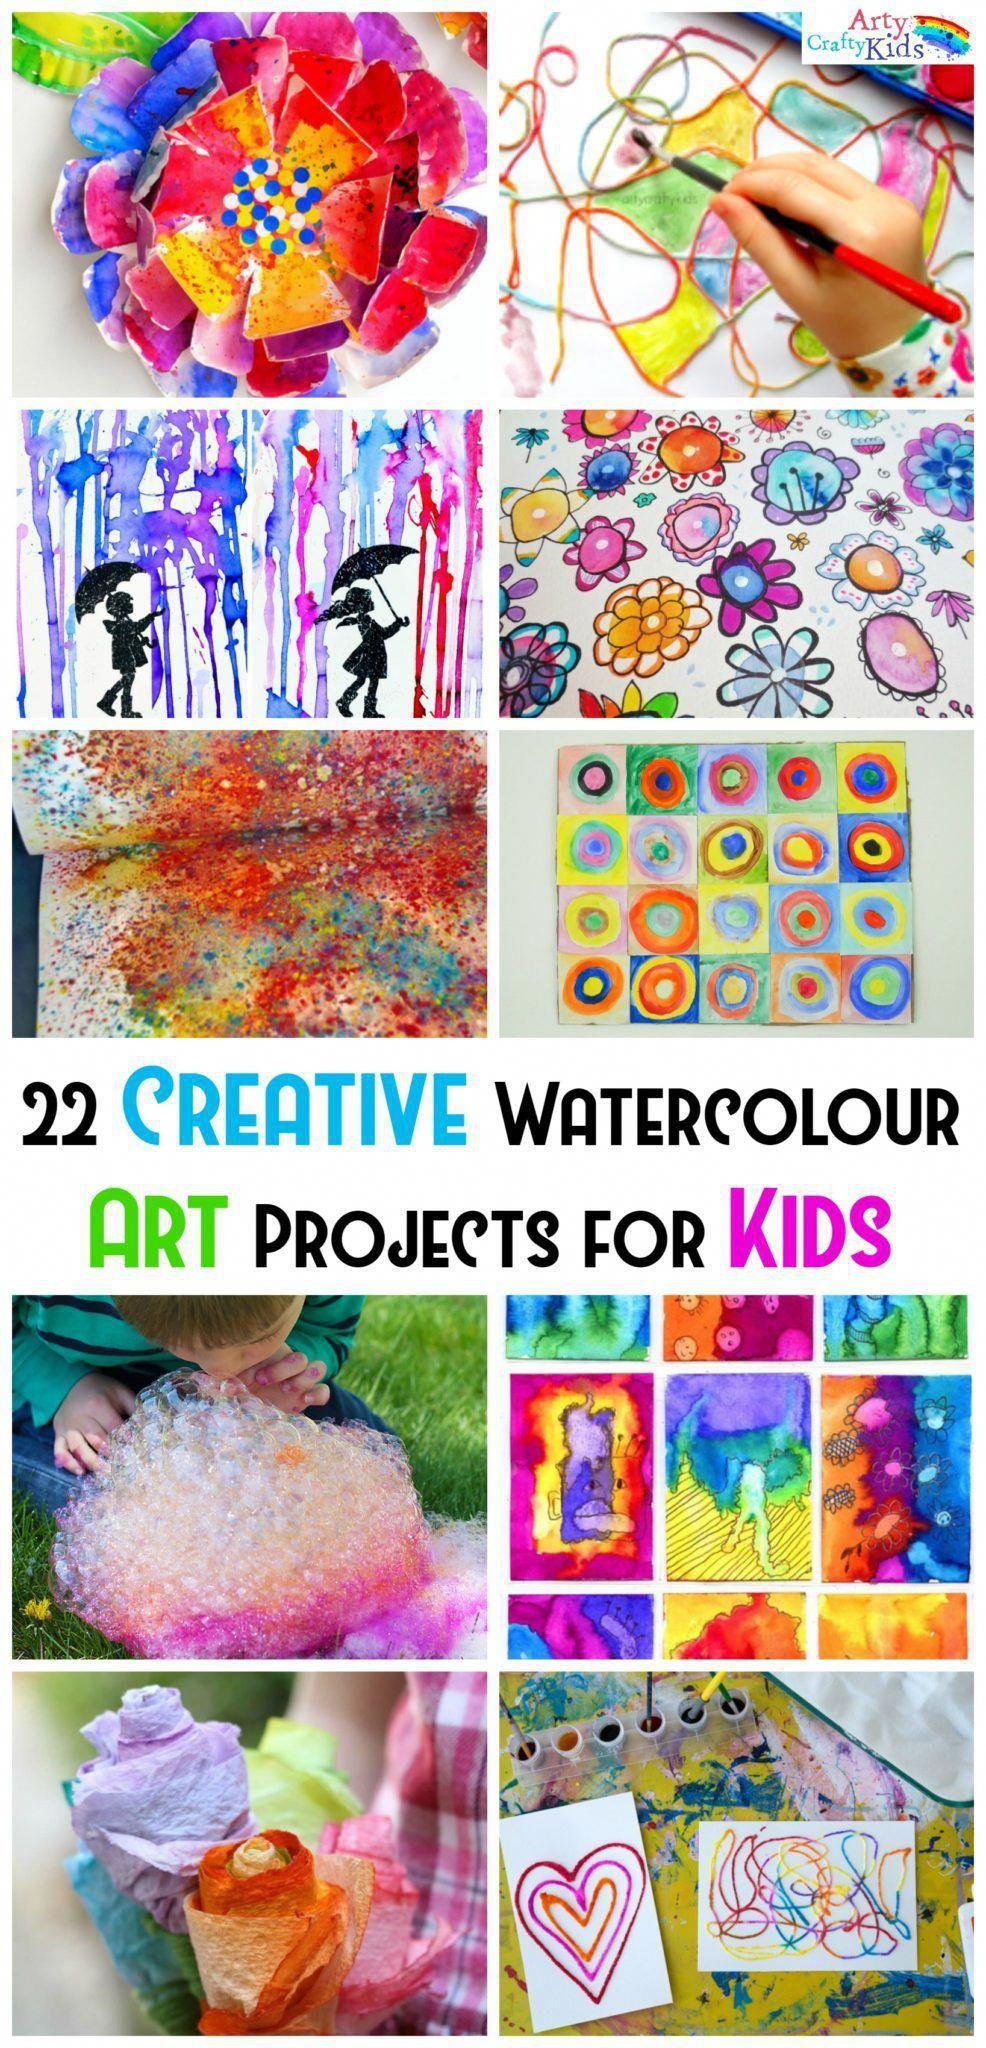 Arty Crafty Kids Art Kids Art Projects 22 Creative Watercolor